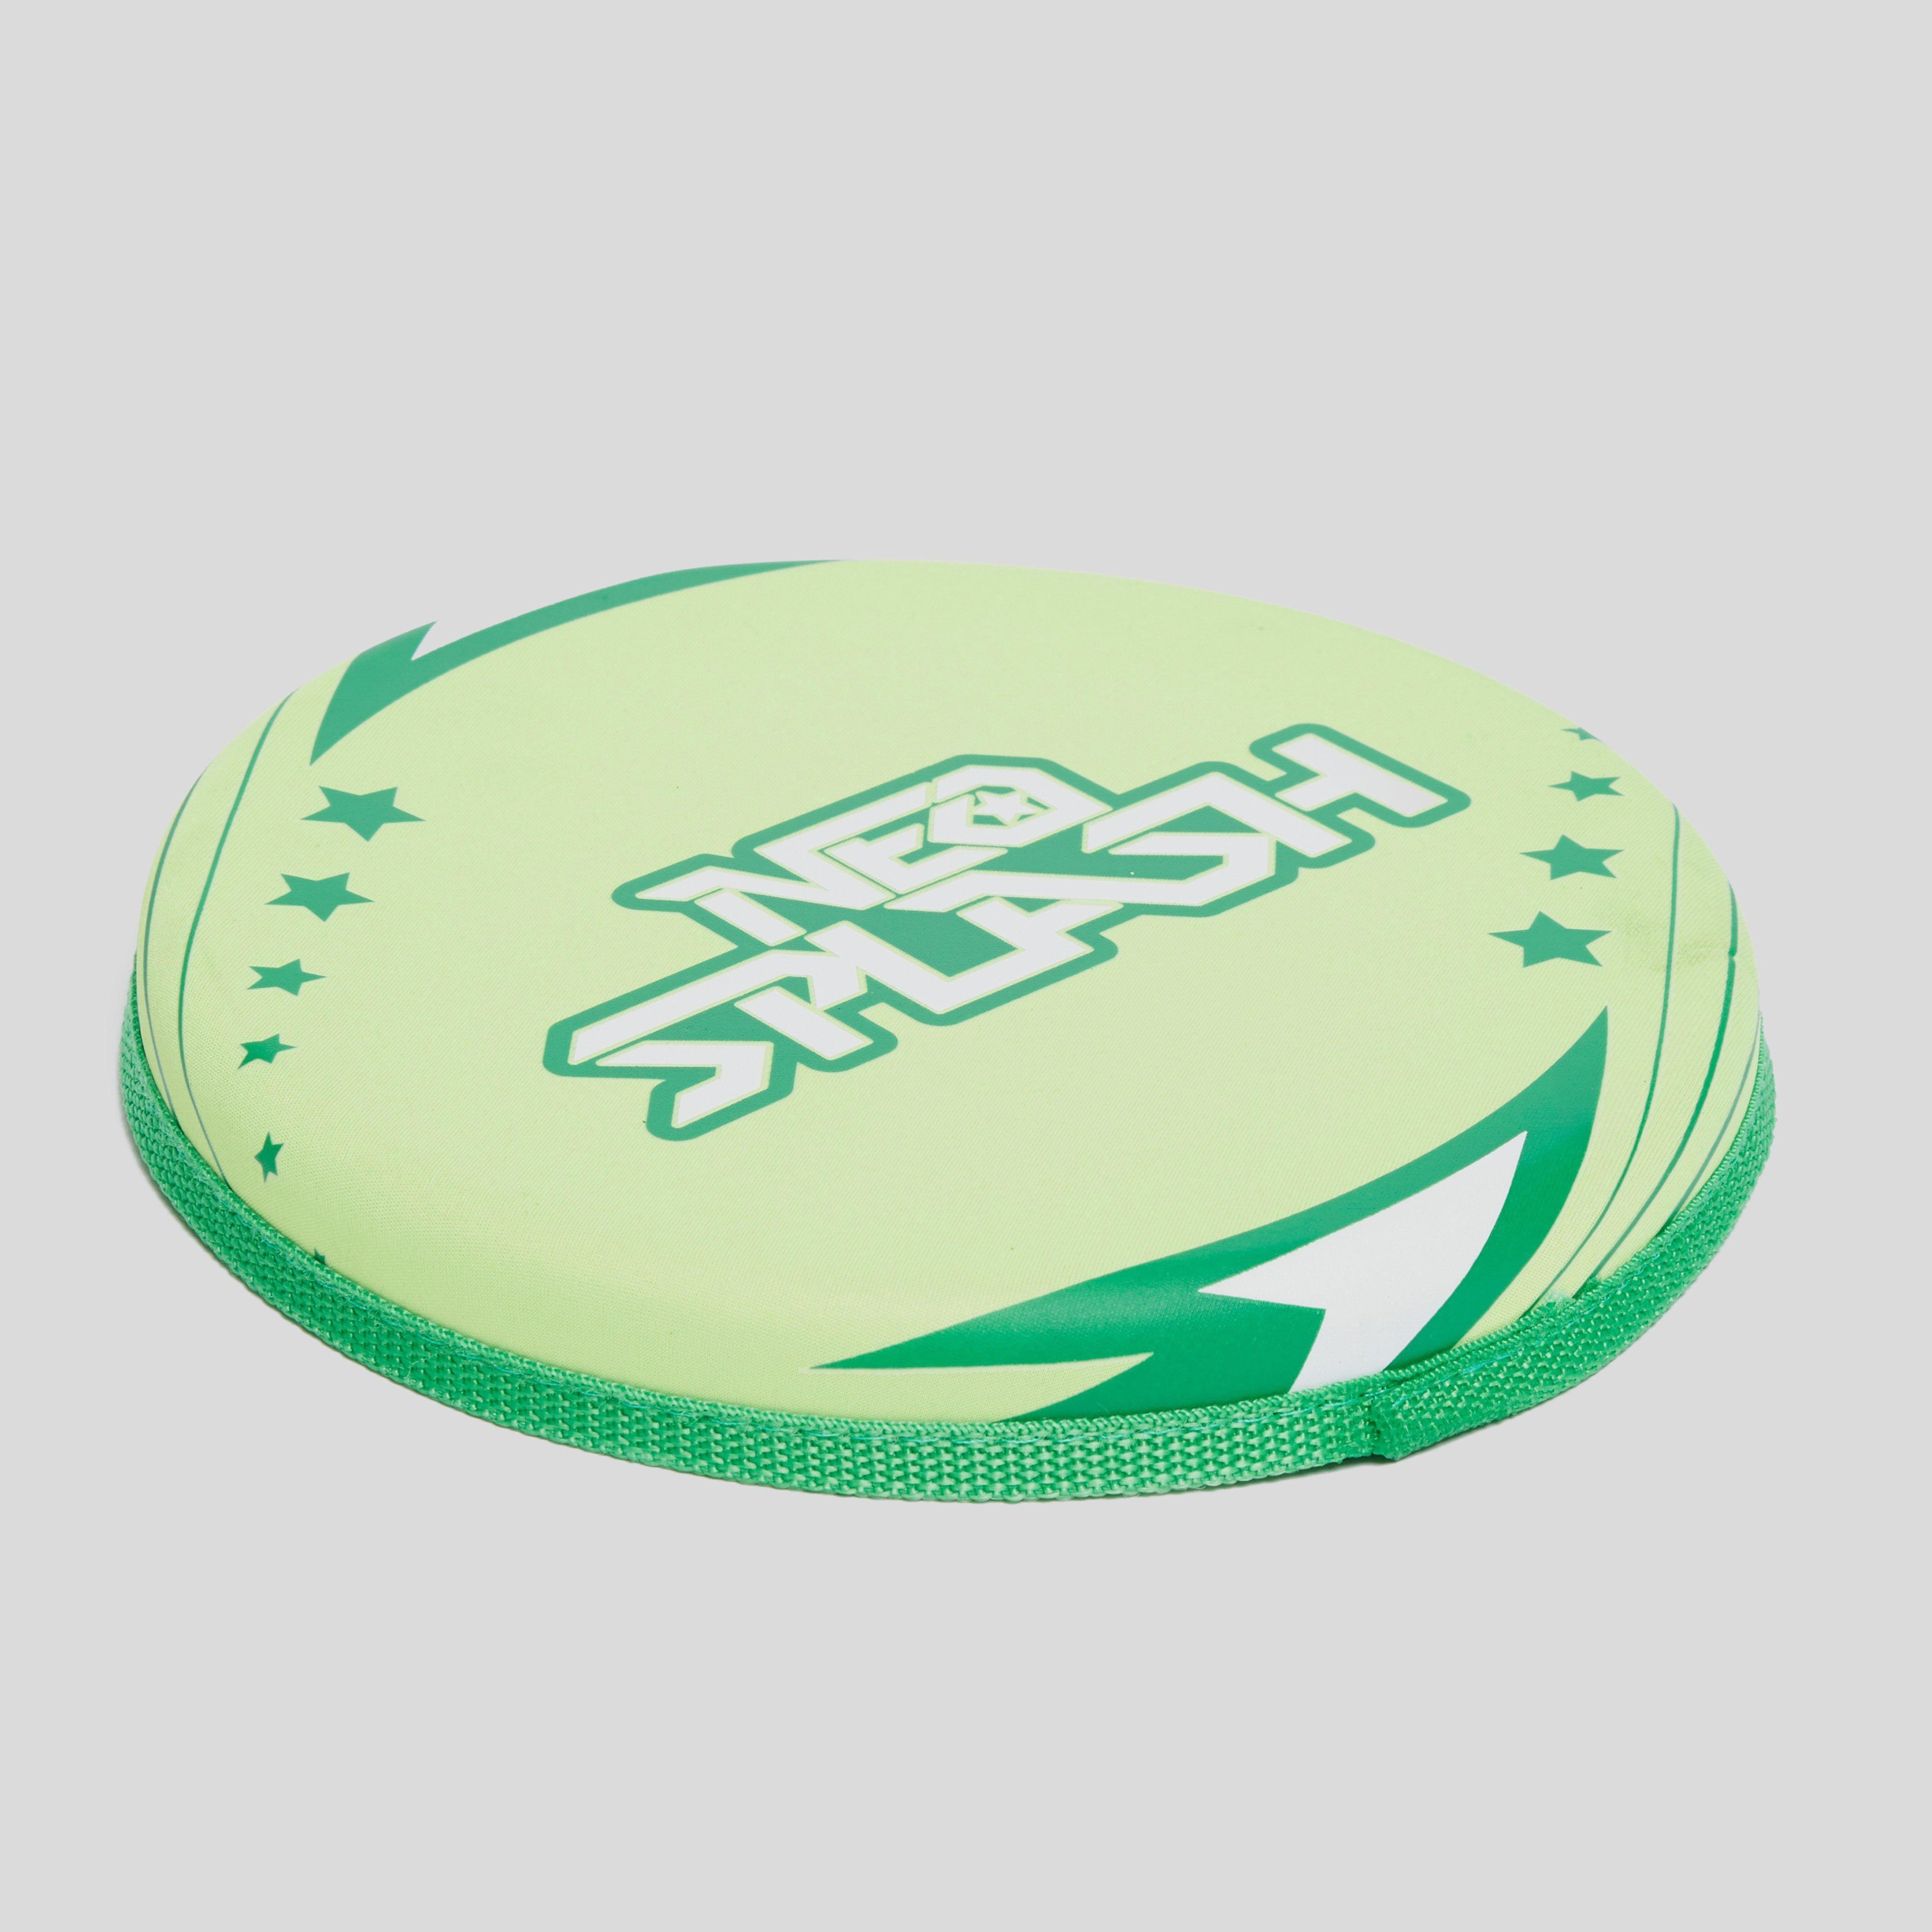 Image of Hi-Gear Flying Disk (9.5-Inch) - Green/Grn, Green/GRN